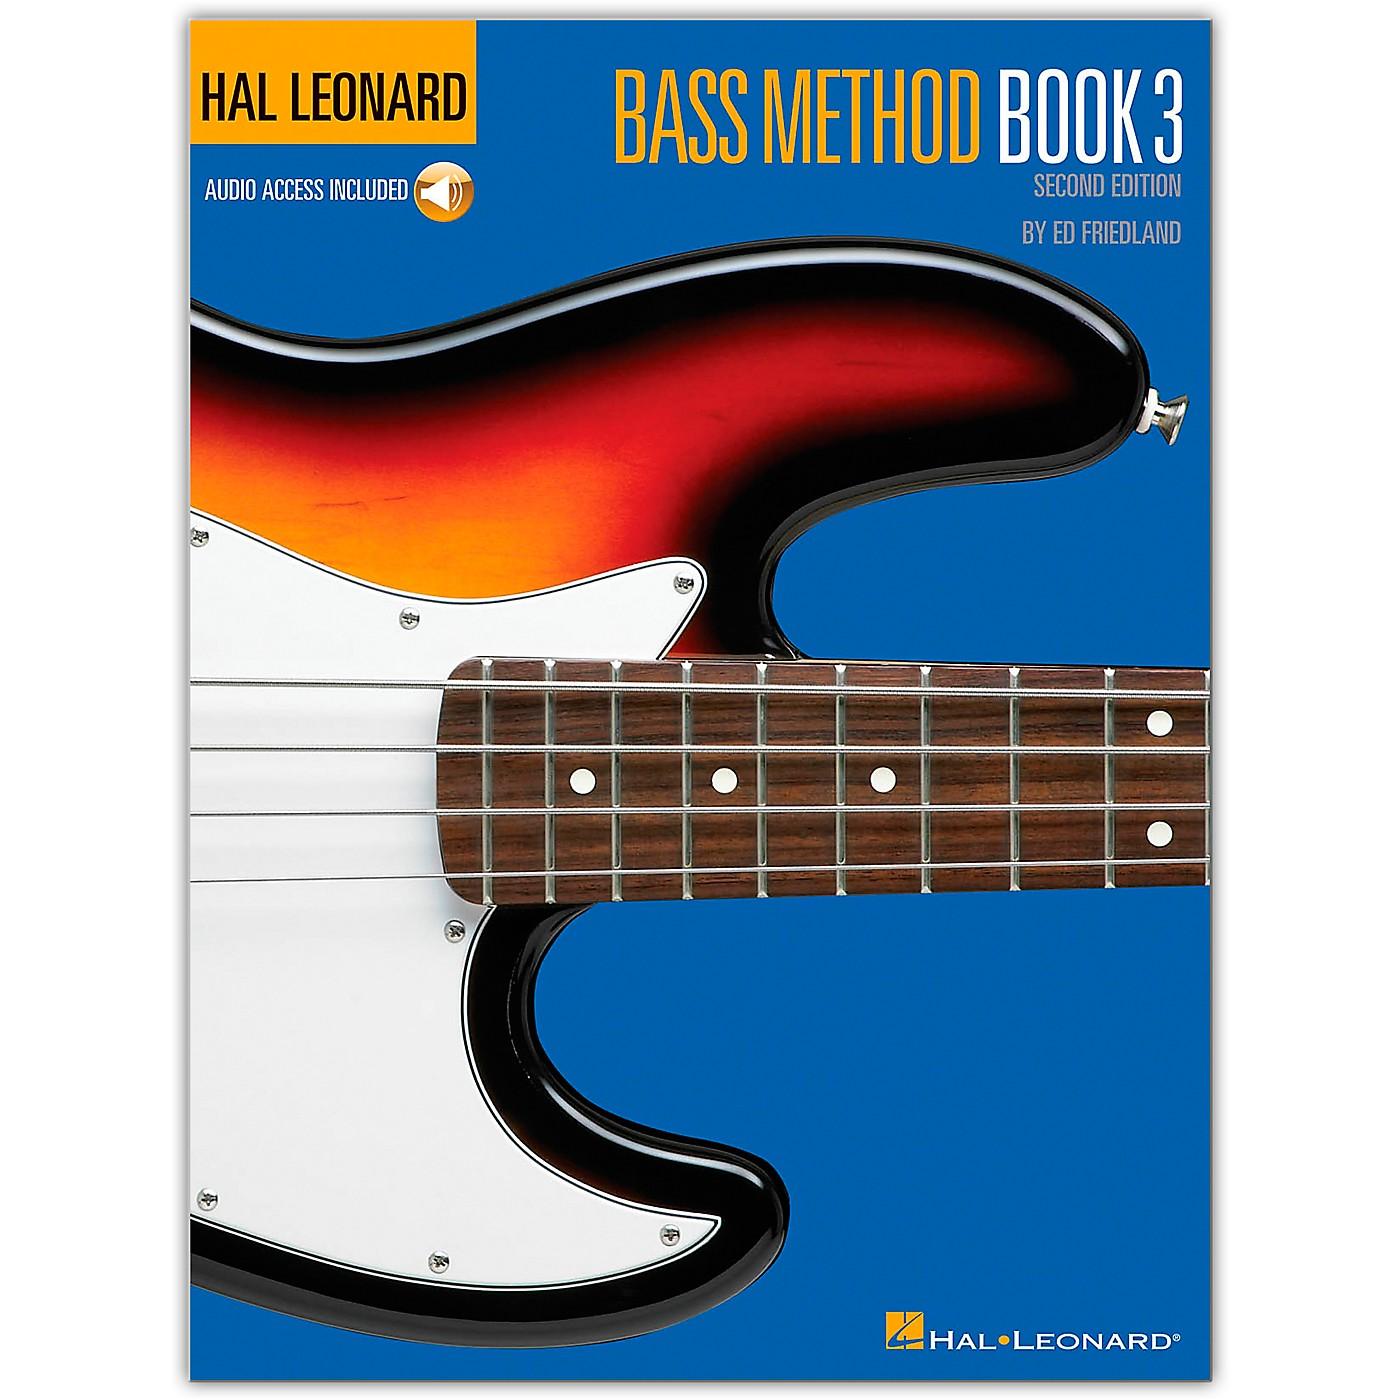 Hal Leonard Bass Method Book 3 - 2nd Edition (Book/Online Audio) thumbnail